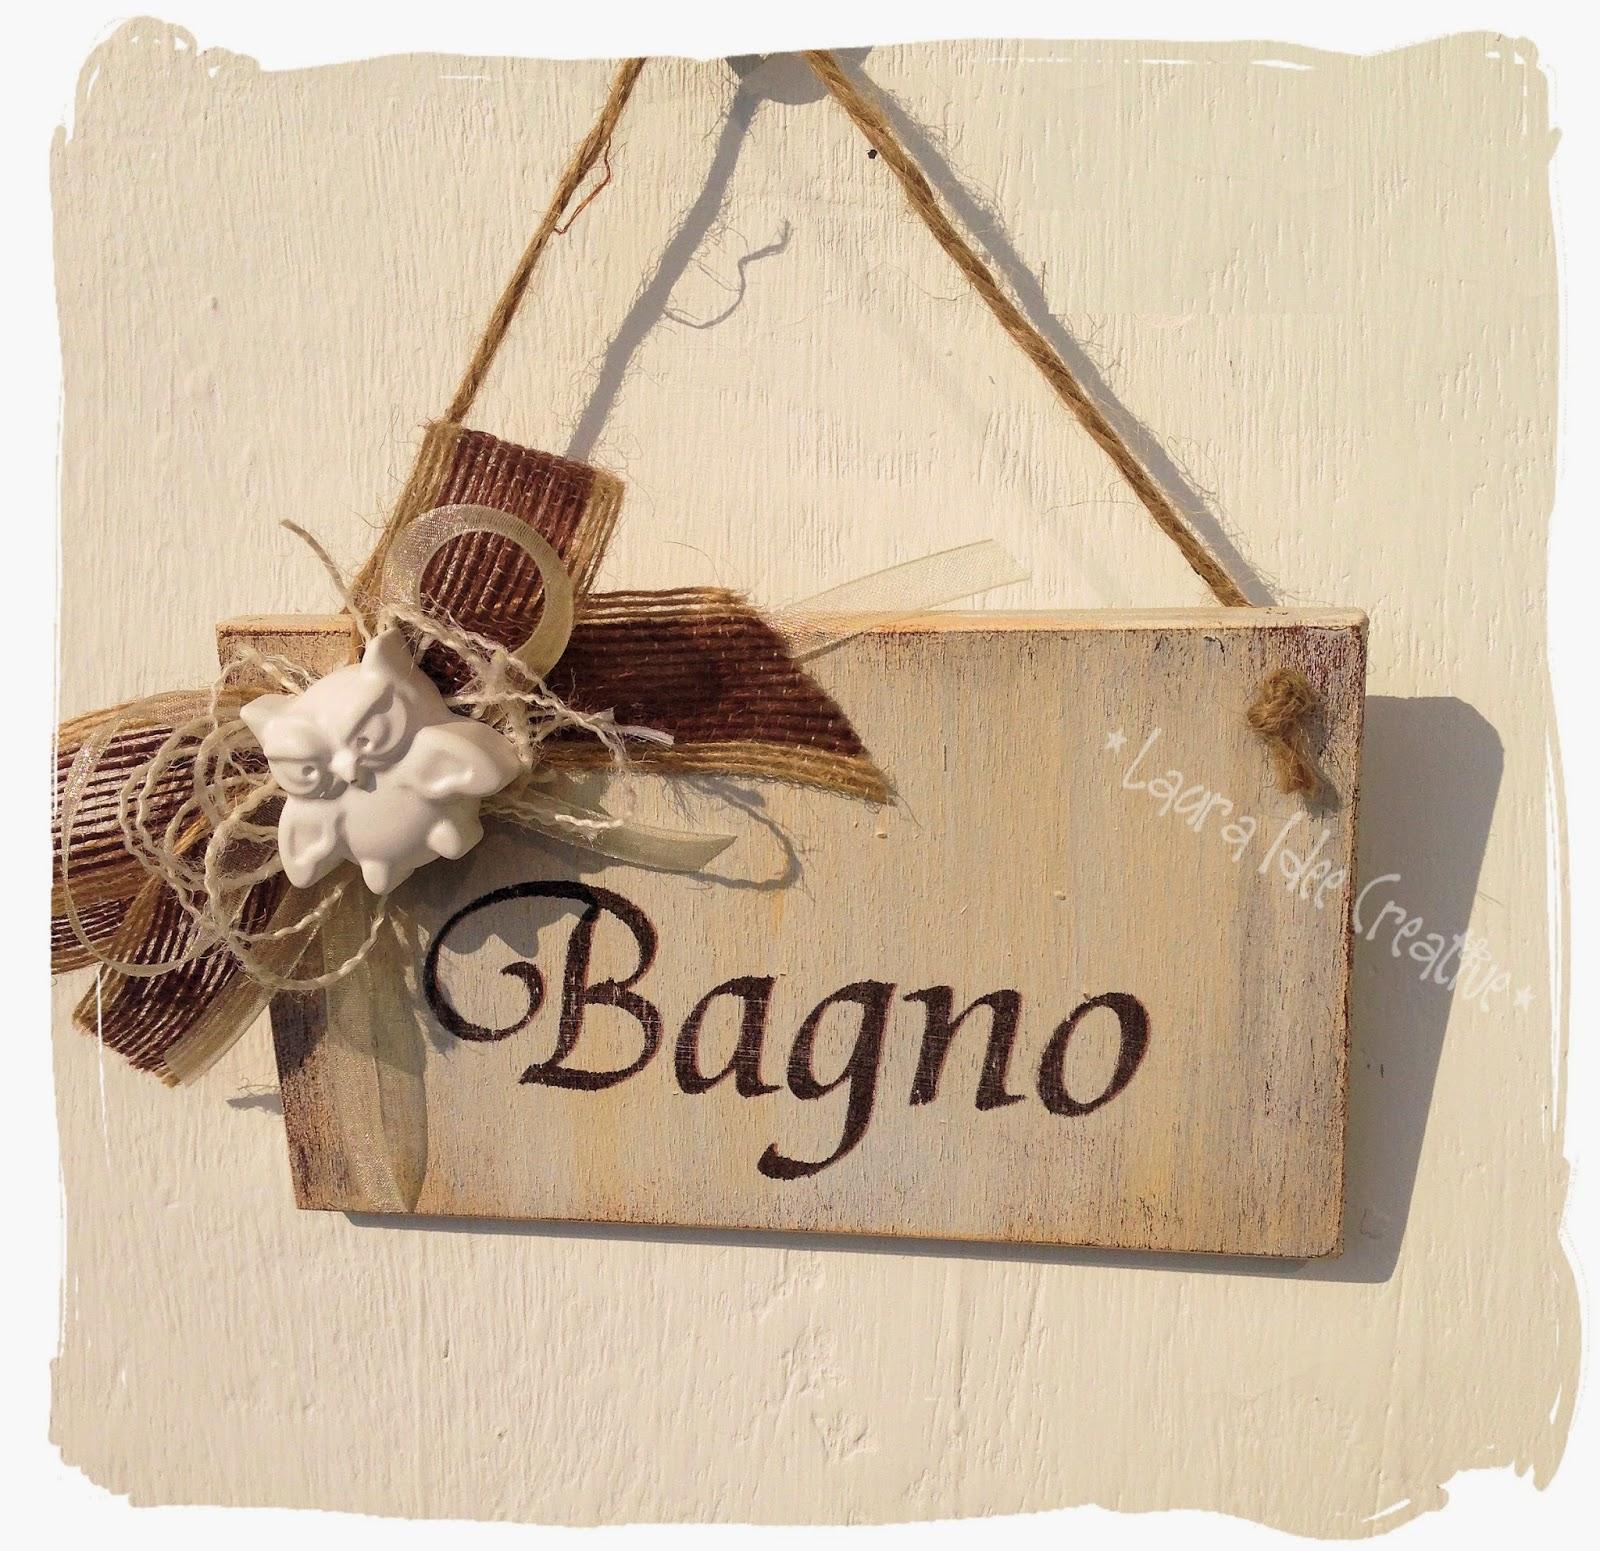 Laura idee creative cartelli in legno per agriturismo e - Targhette porta ...